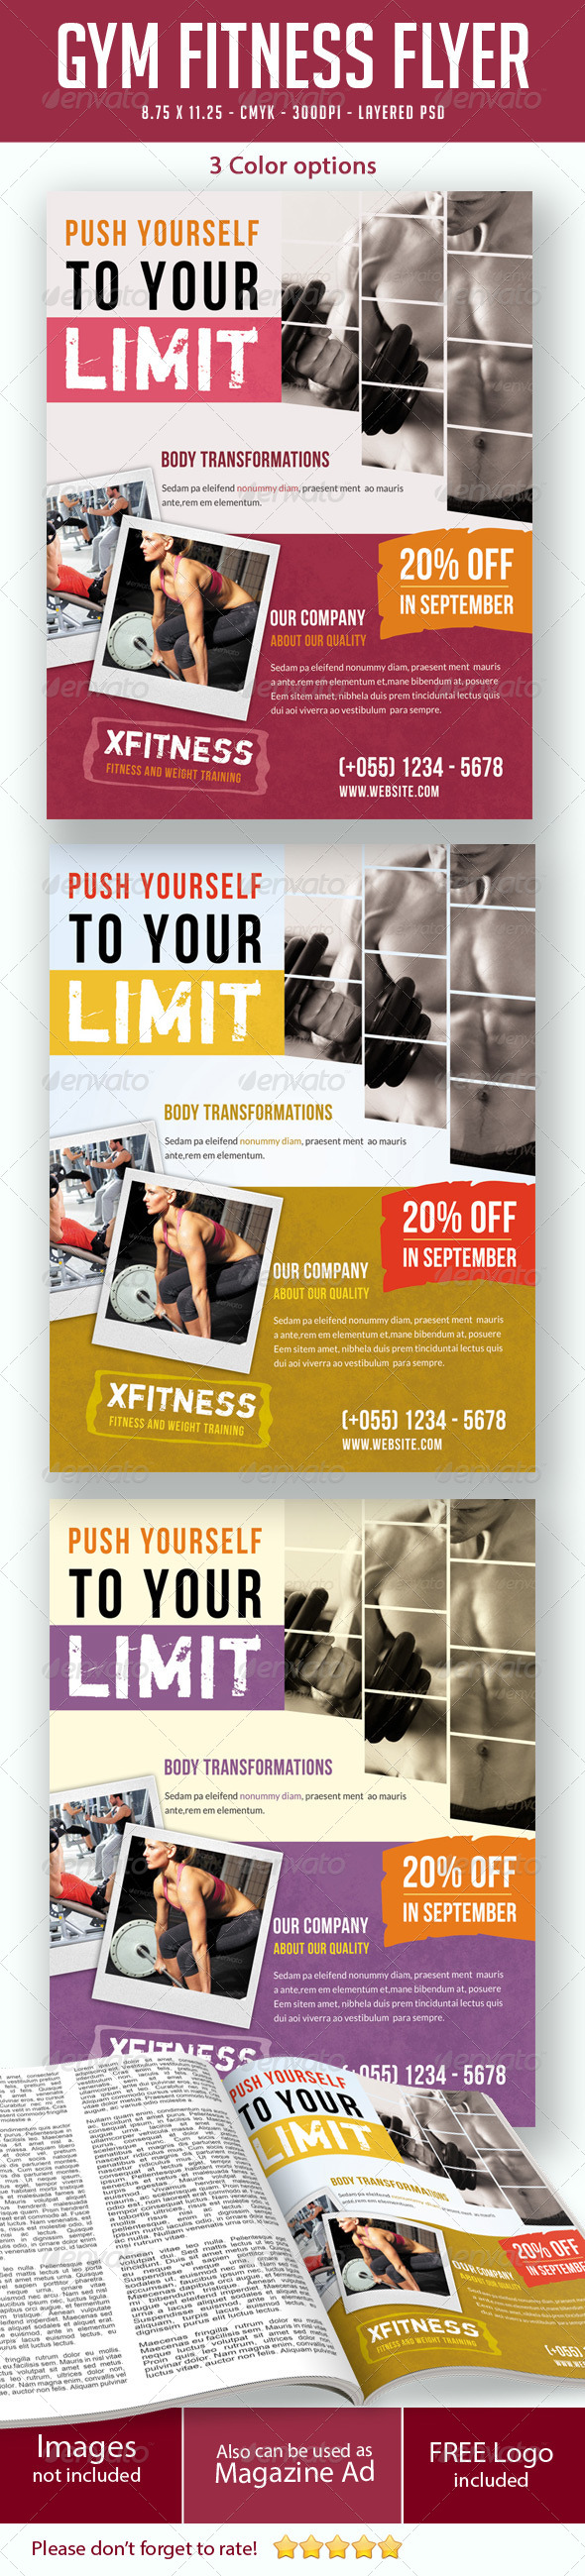 Gym / Fitness Flyer Print Ad